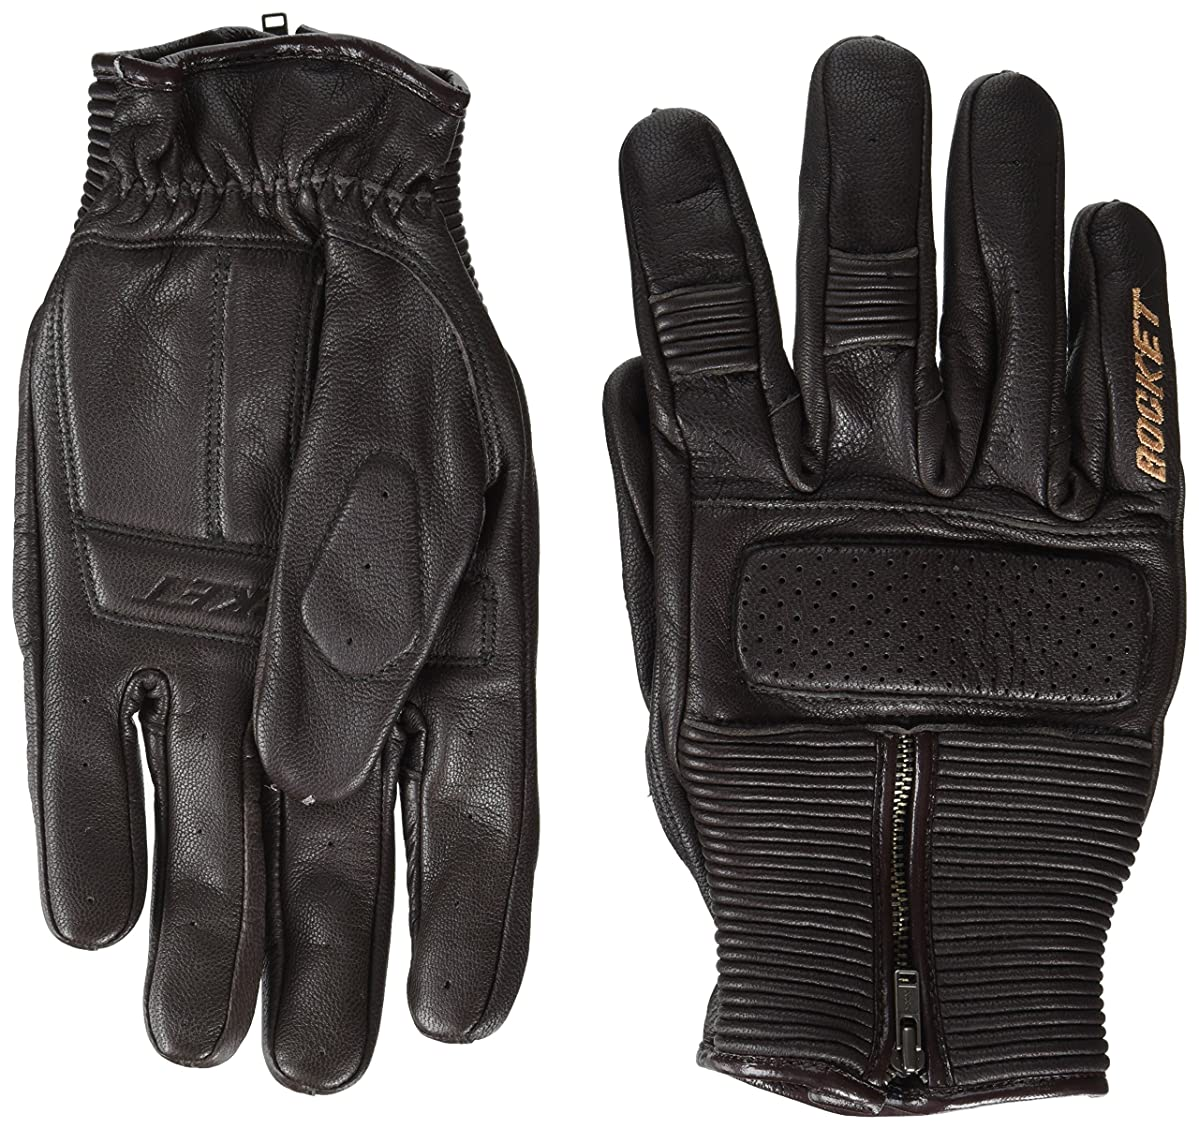 Joe Rocket Men's Café Racer Motorcycle Gloves (Brown, X-Large)